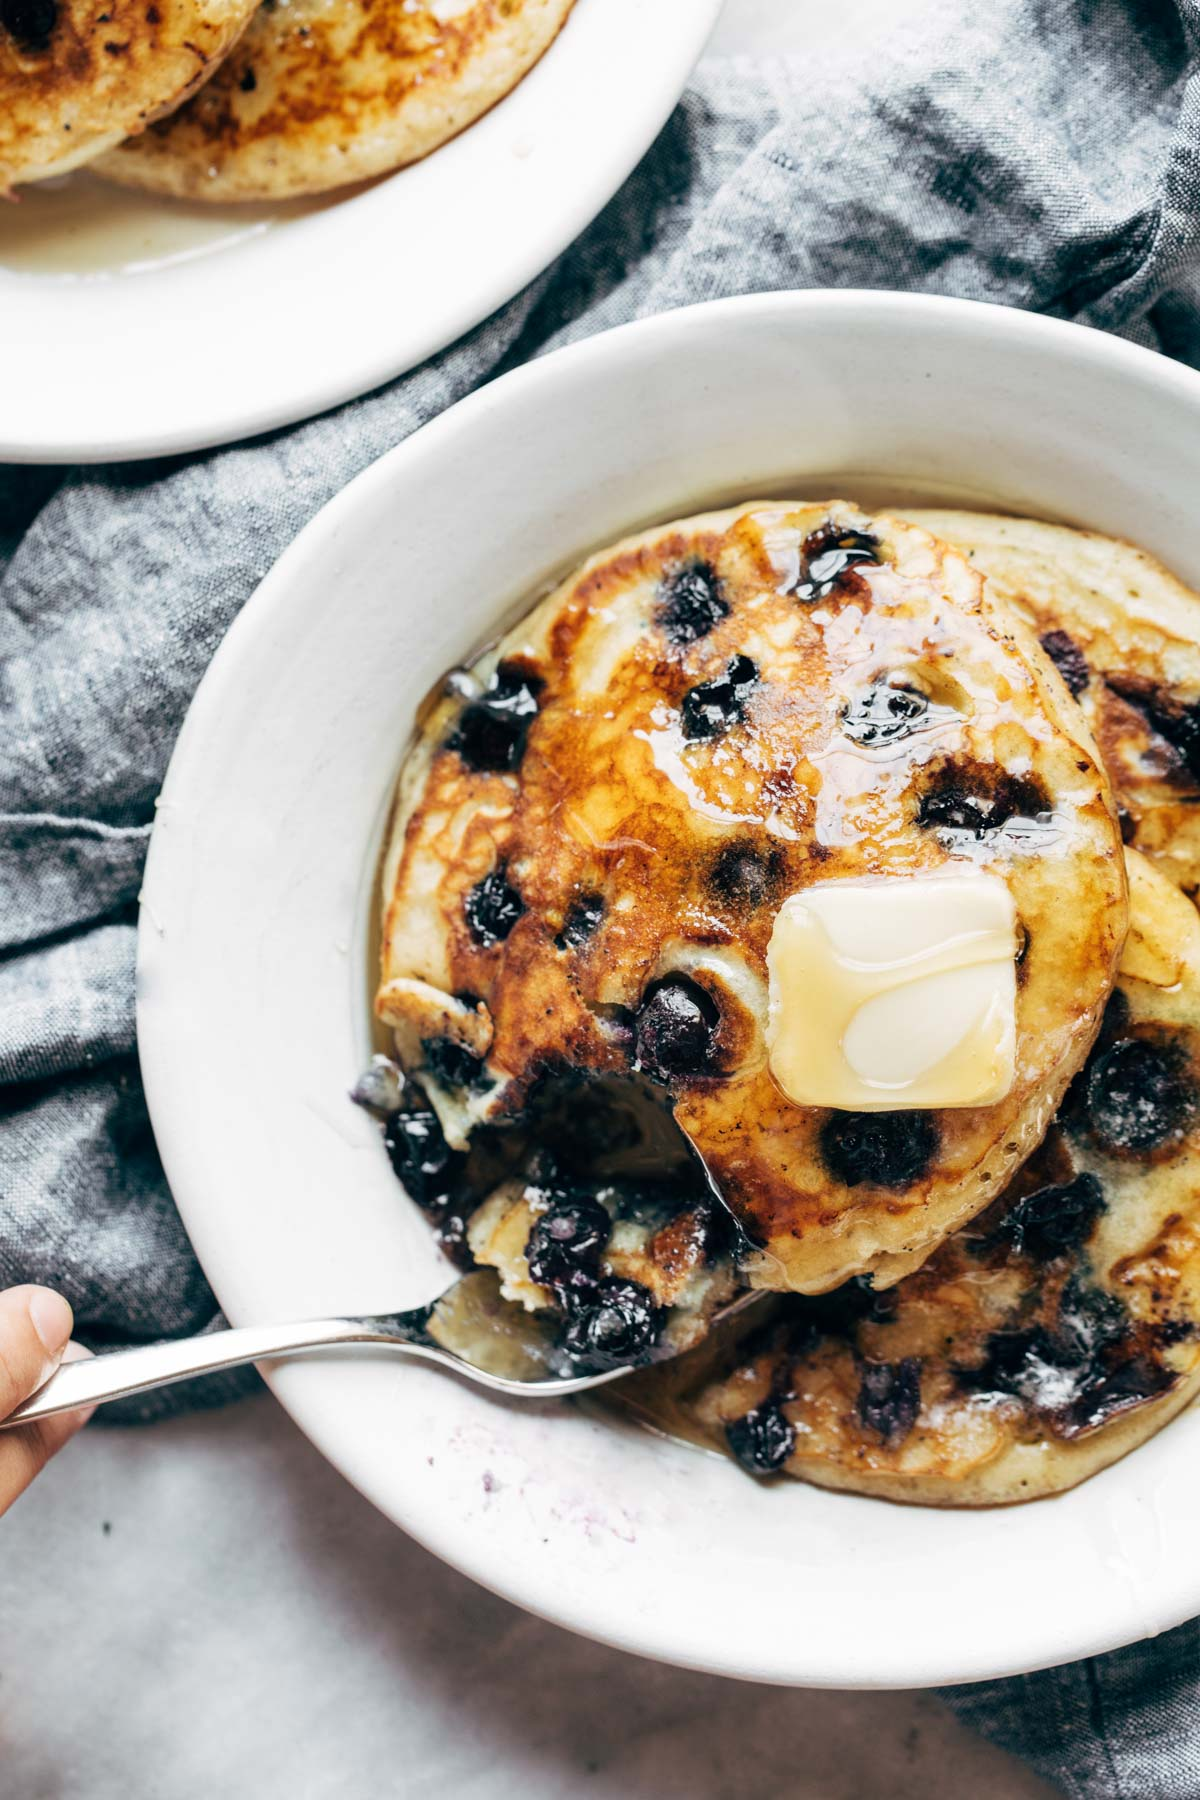 Taking-a-Bite-of-Blueberry-Pancakes.jpg